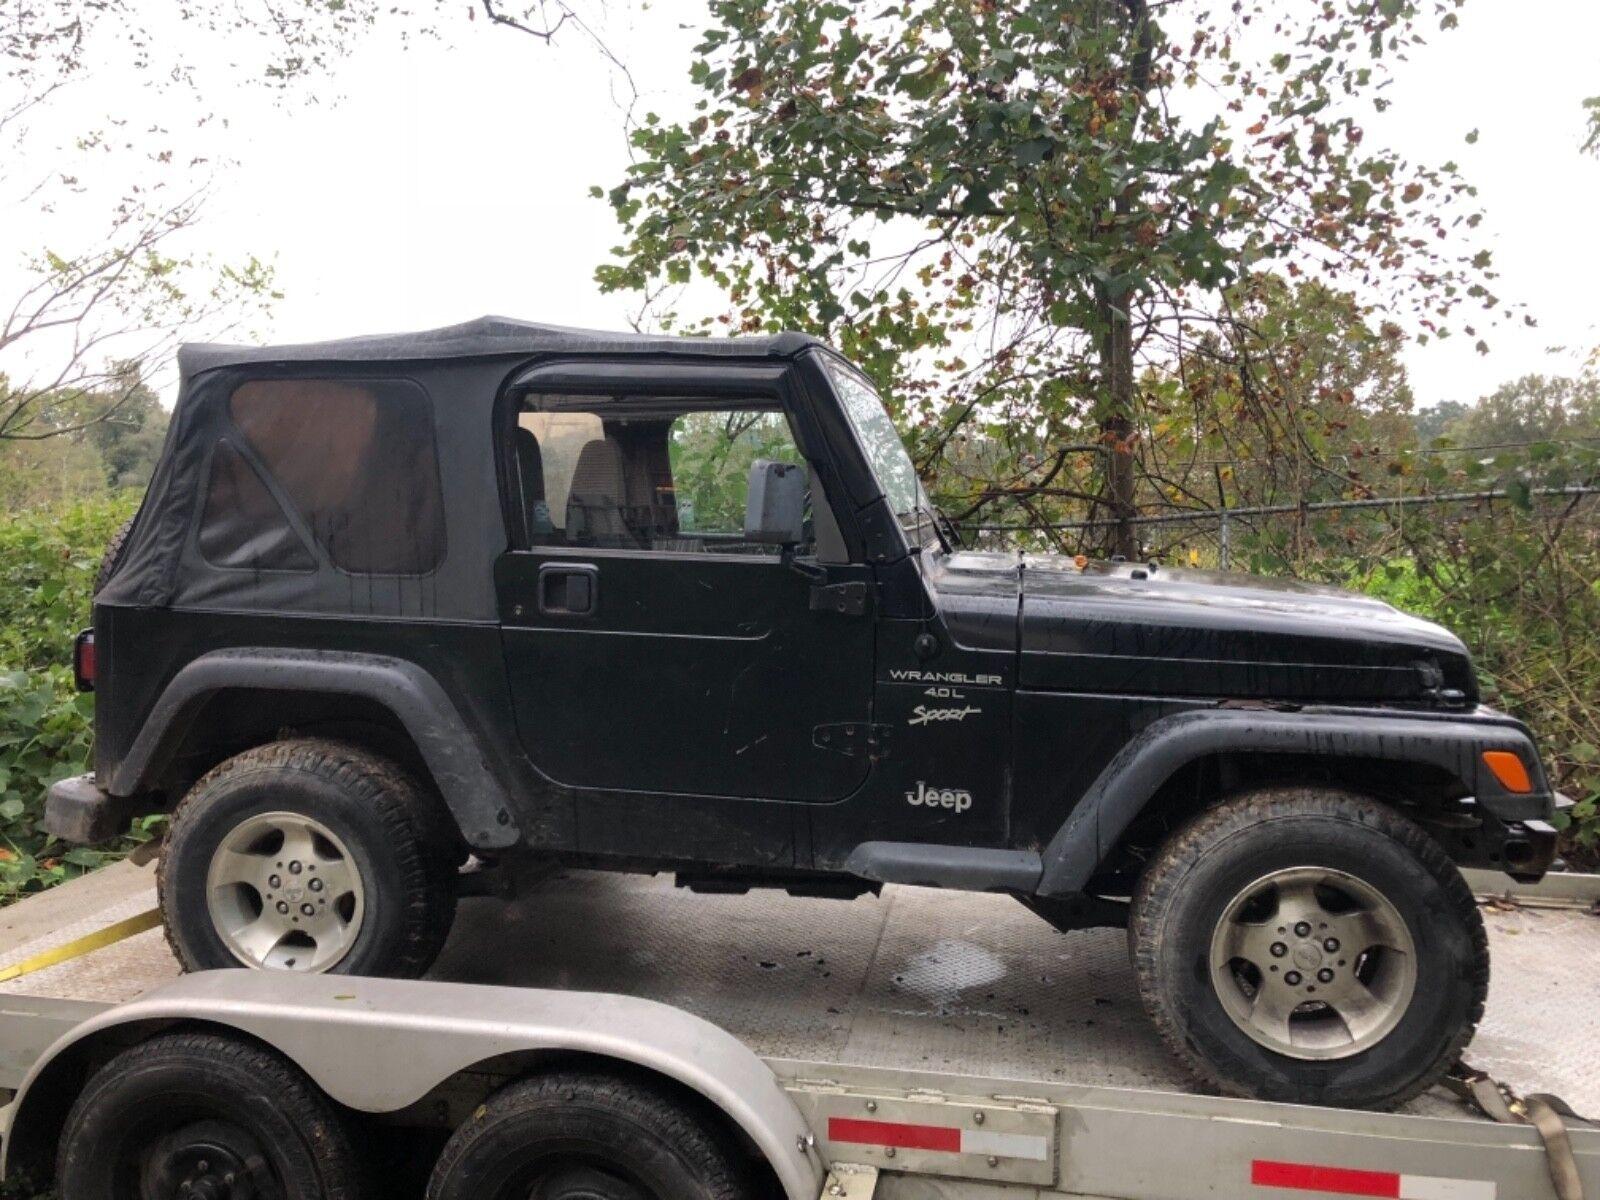 2000 Jeep Wrangler Sport 2000 Jeep Wrangler Sport Black Only 101K Miles Auto 4x4 TJ 4.0L Needs TLC Look